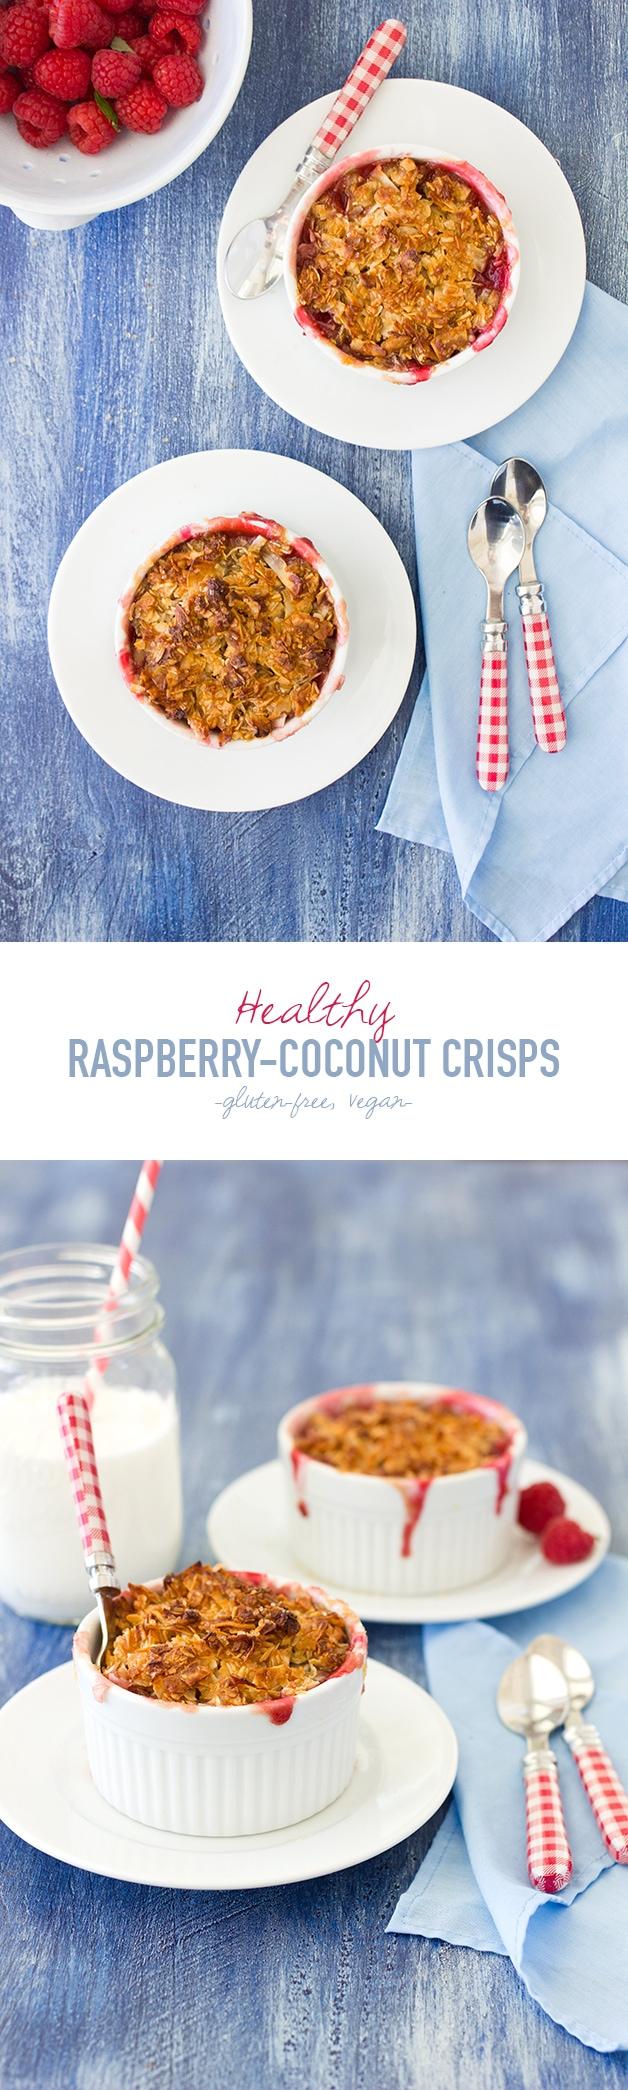 Healthy Raspberry-Coconut Crisps: an easy, made-for-two crisp recipe that's #glutenfree and #vegan | https://www.brighteyedbaker.com